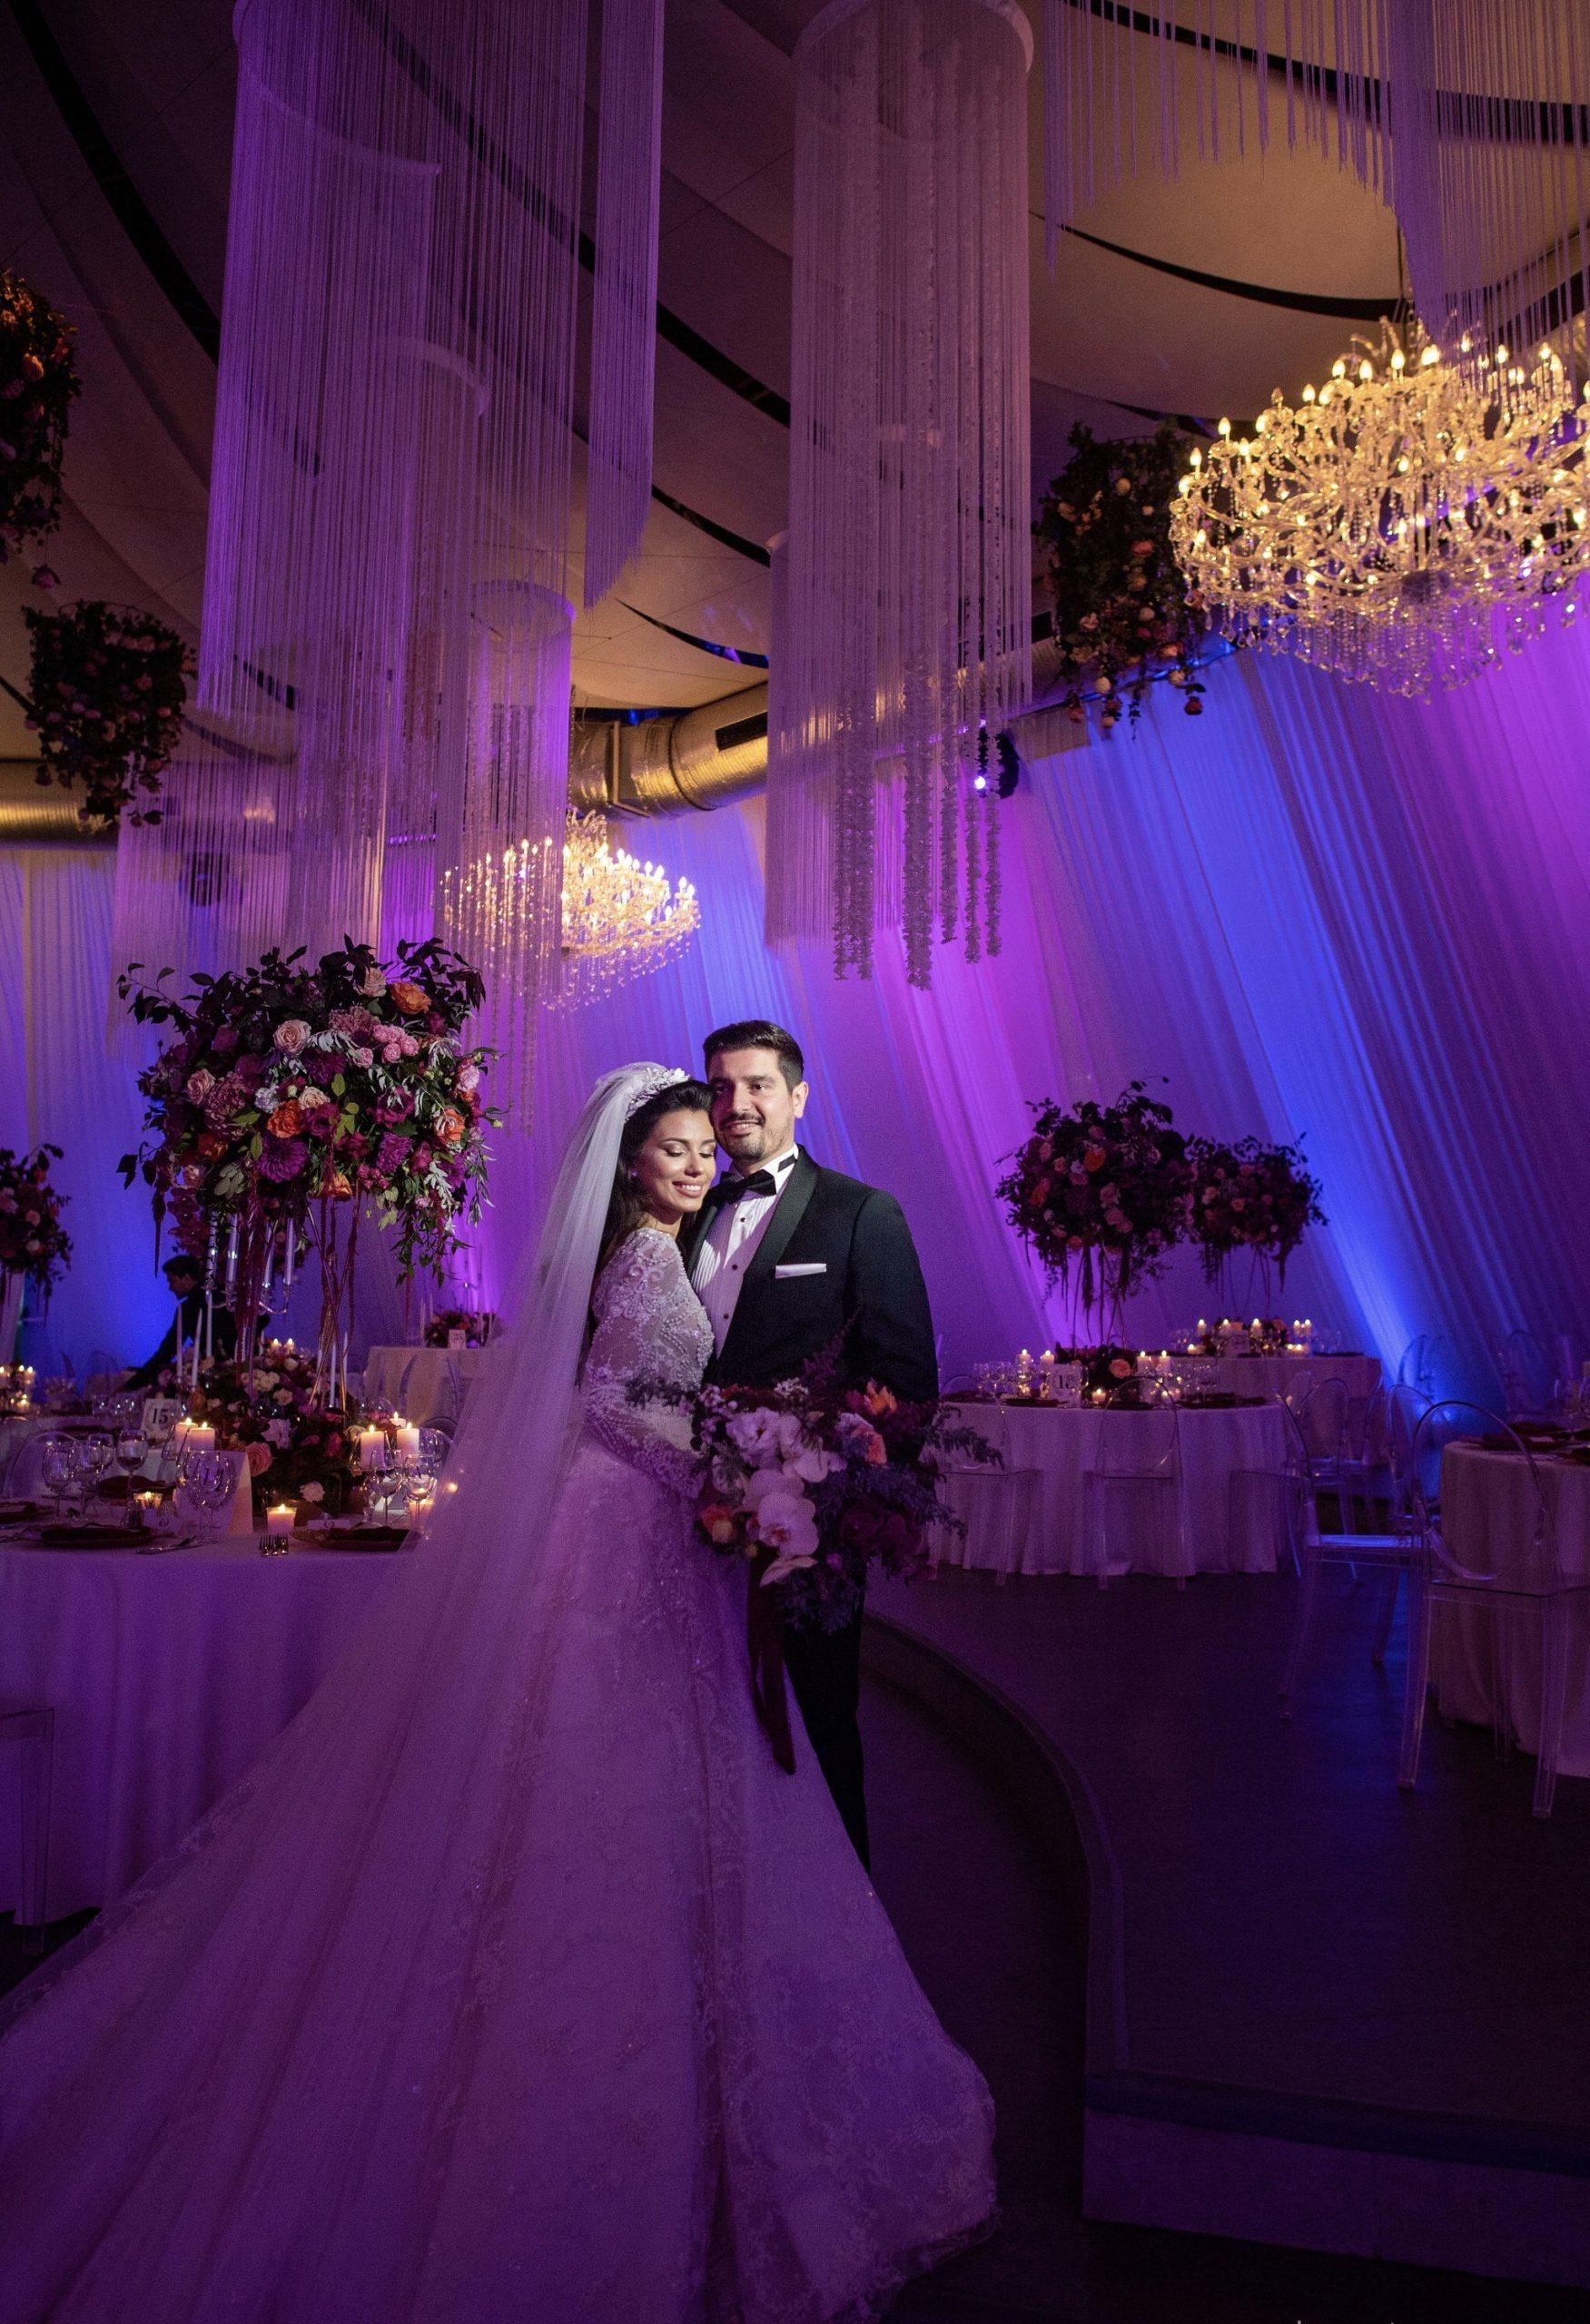 Nunta Ego Idyllic Events, Organizare nunta